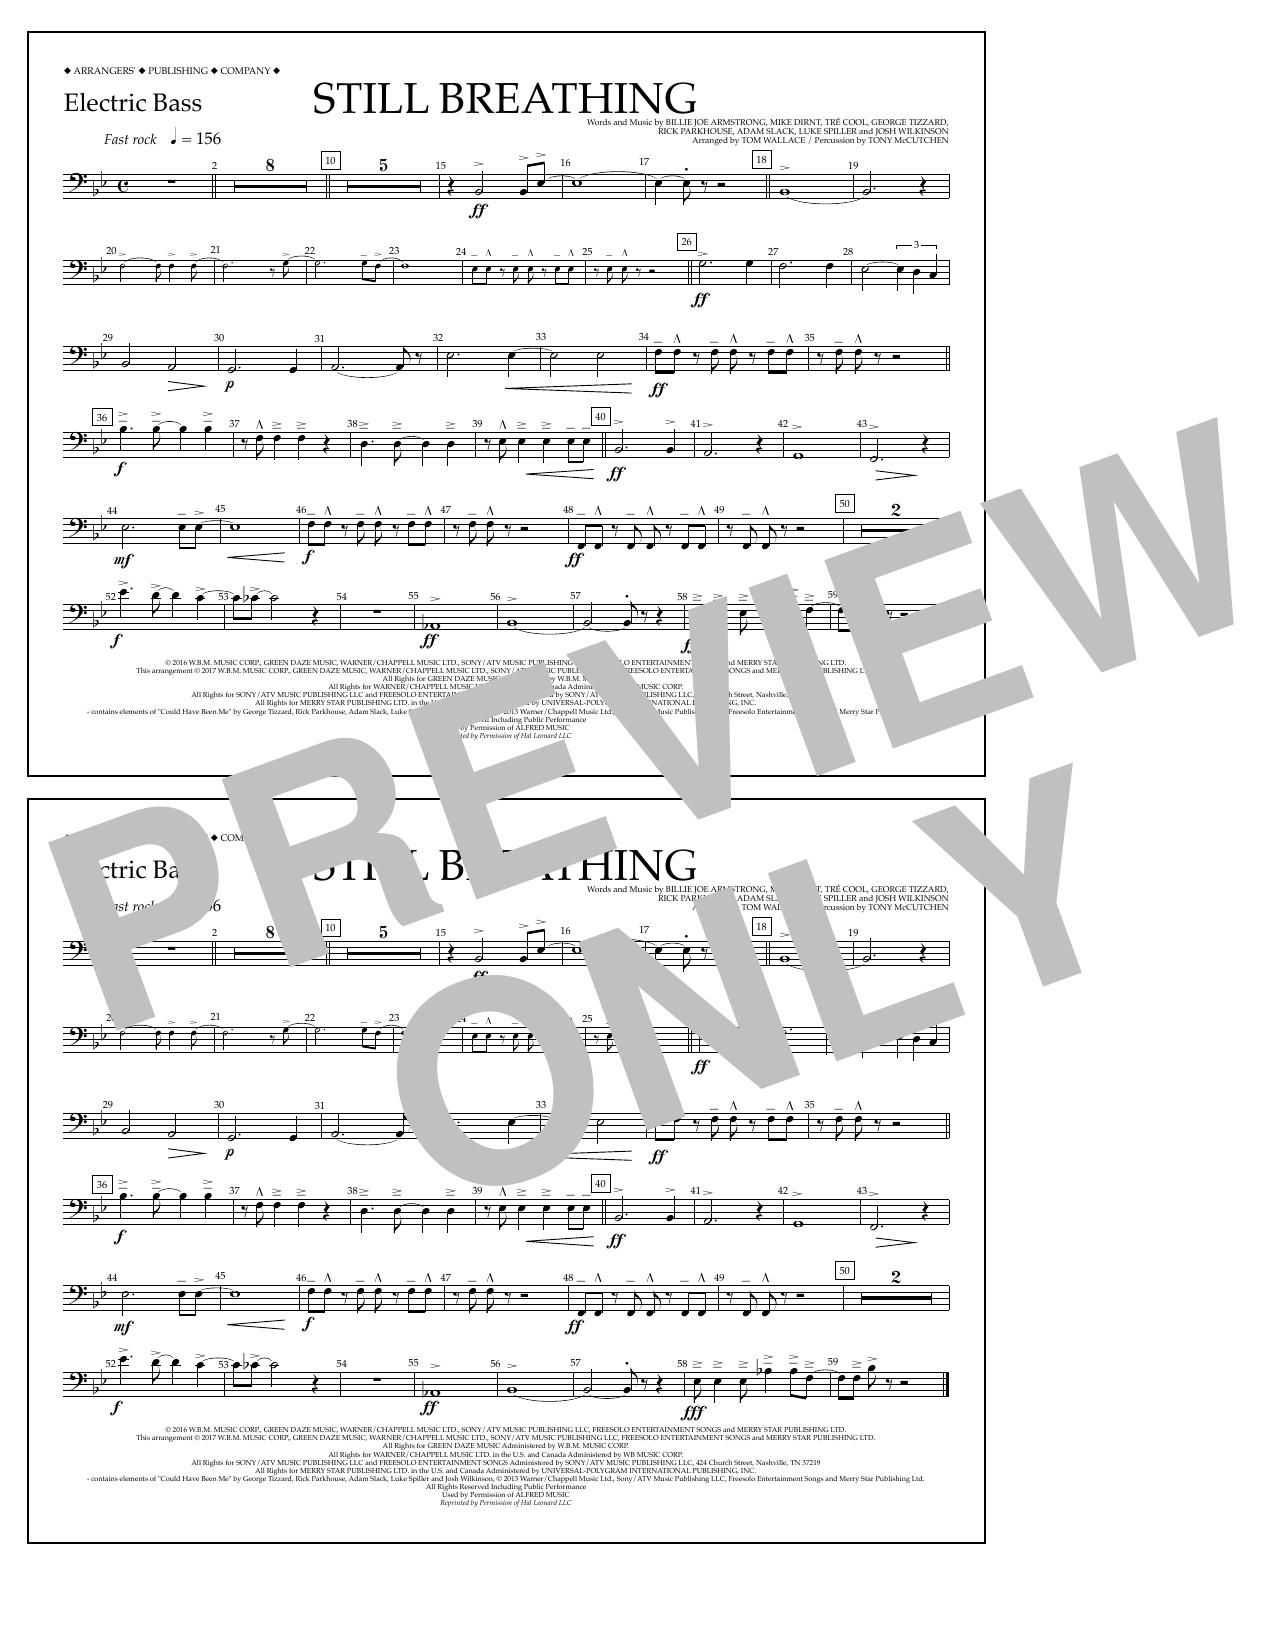 Still Breathing - Electric Bass Sheet Music